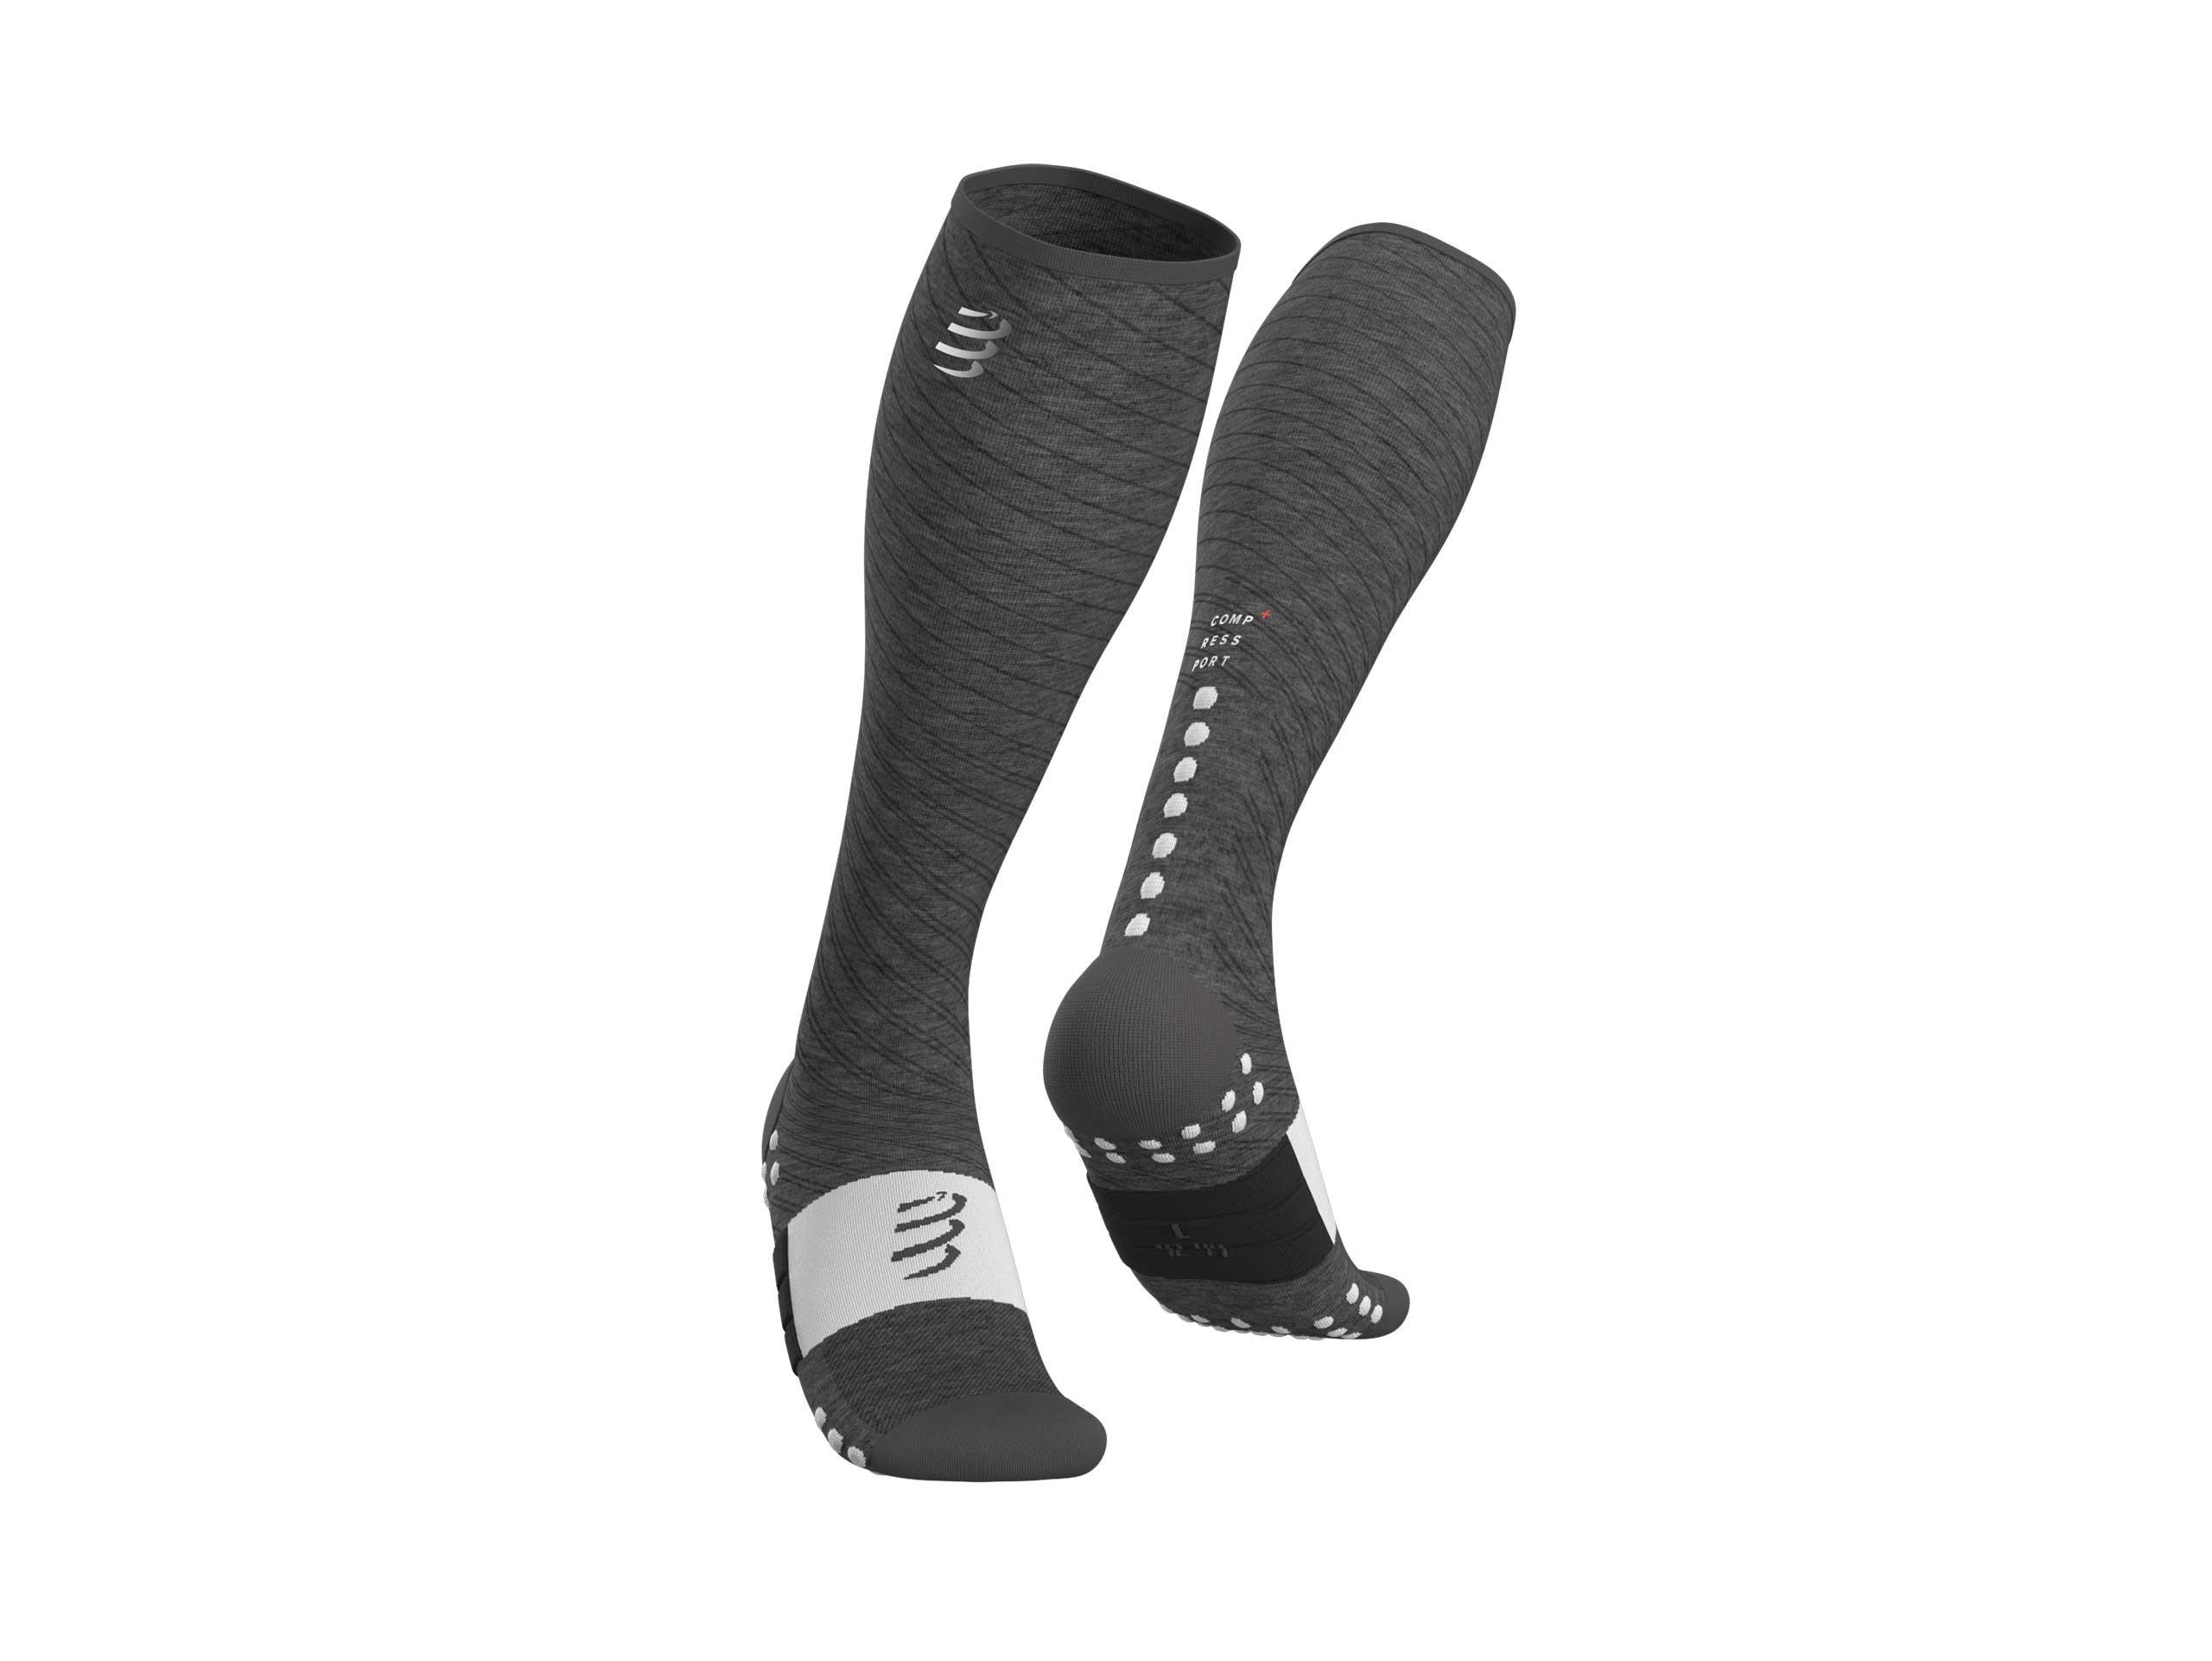 Black Compressport Full Socks Race /& Recovery